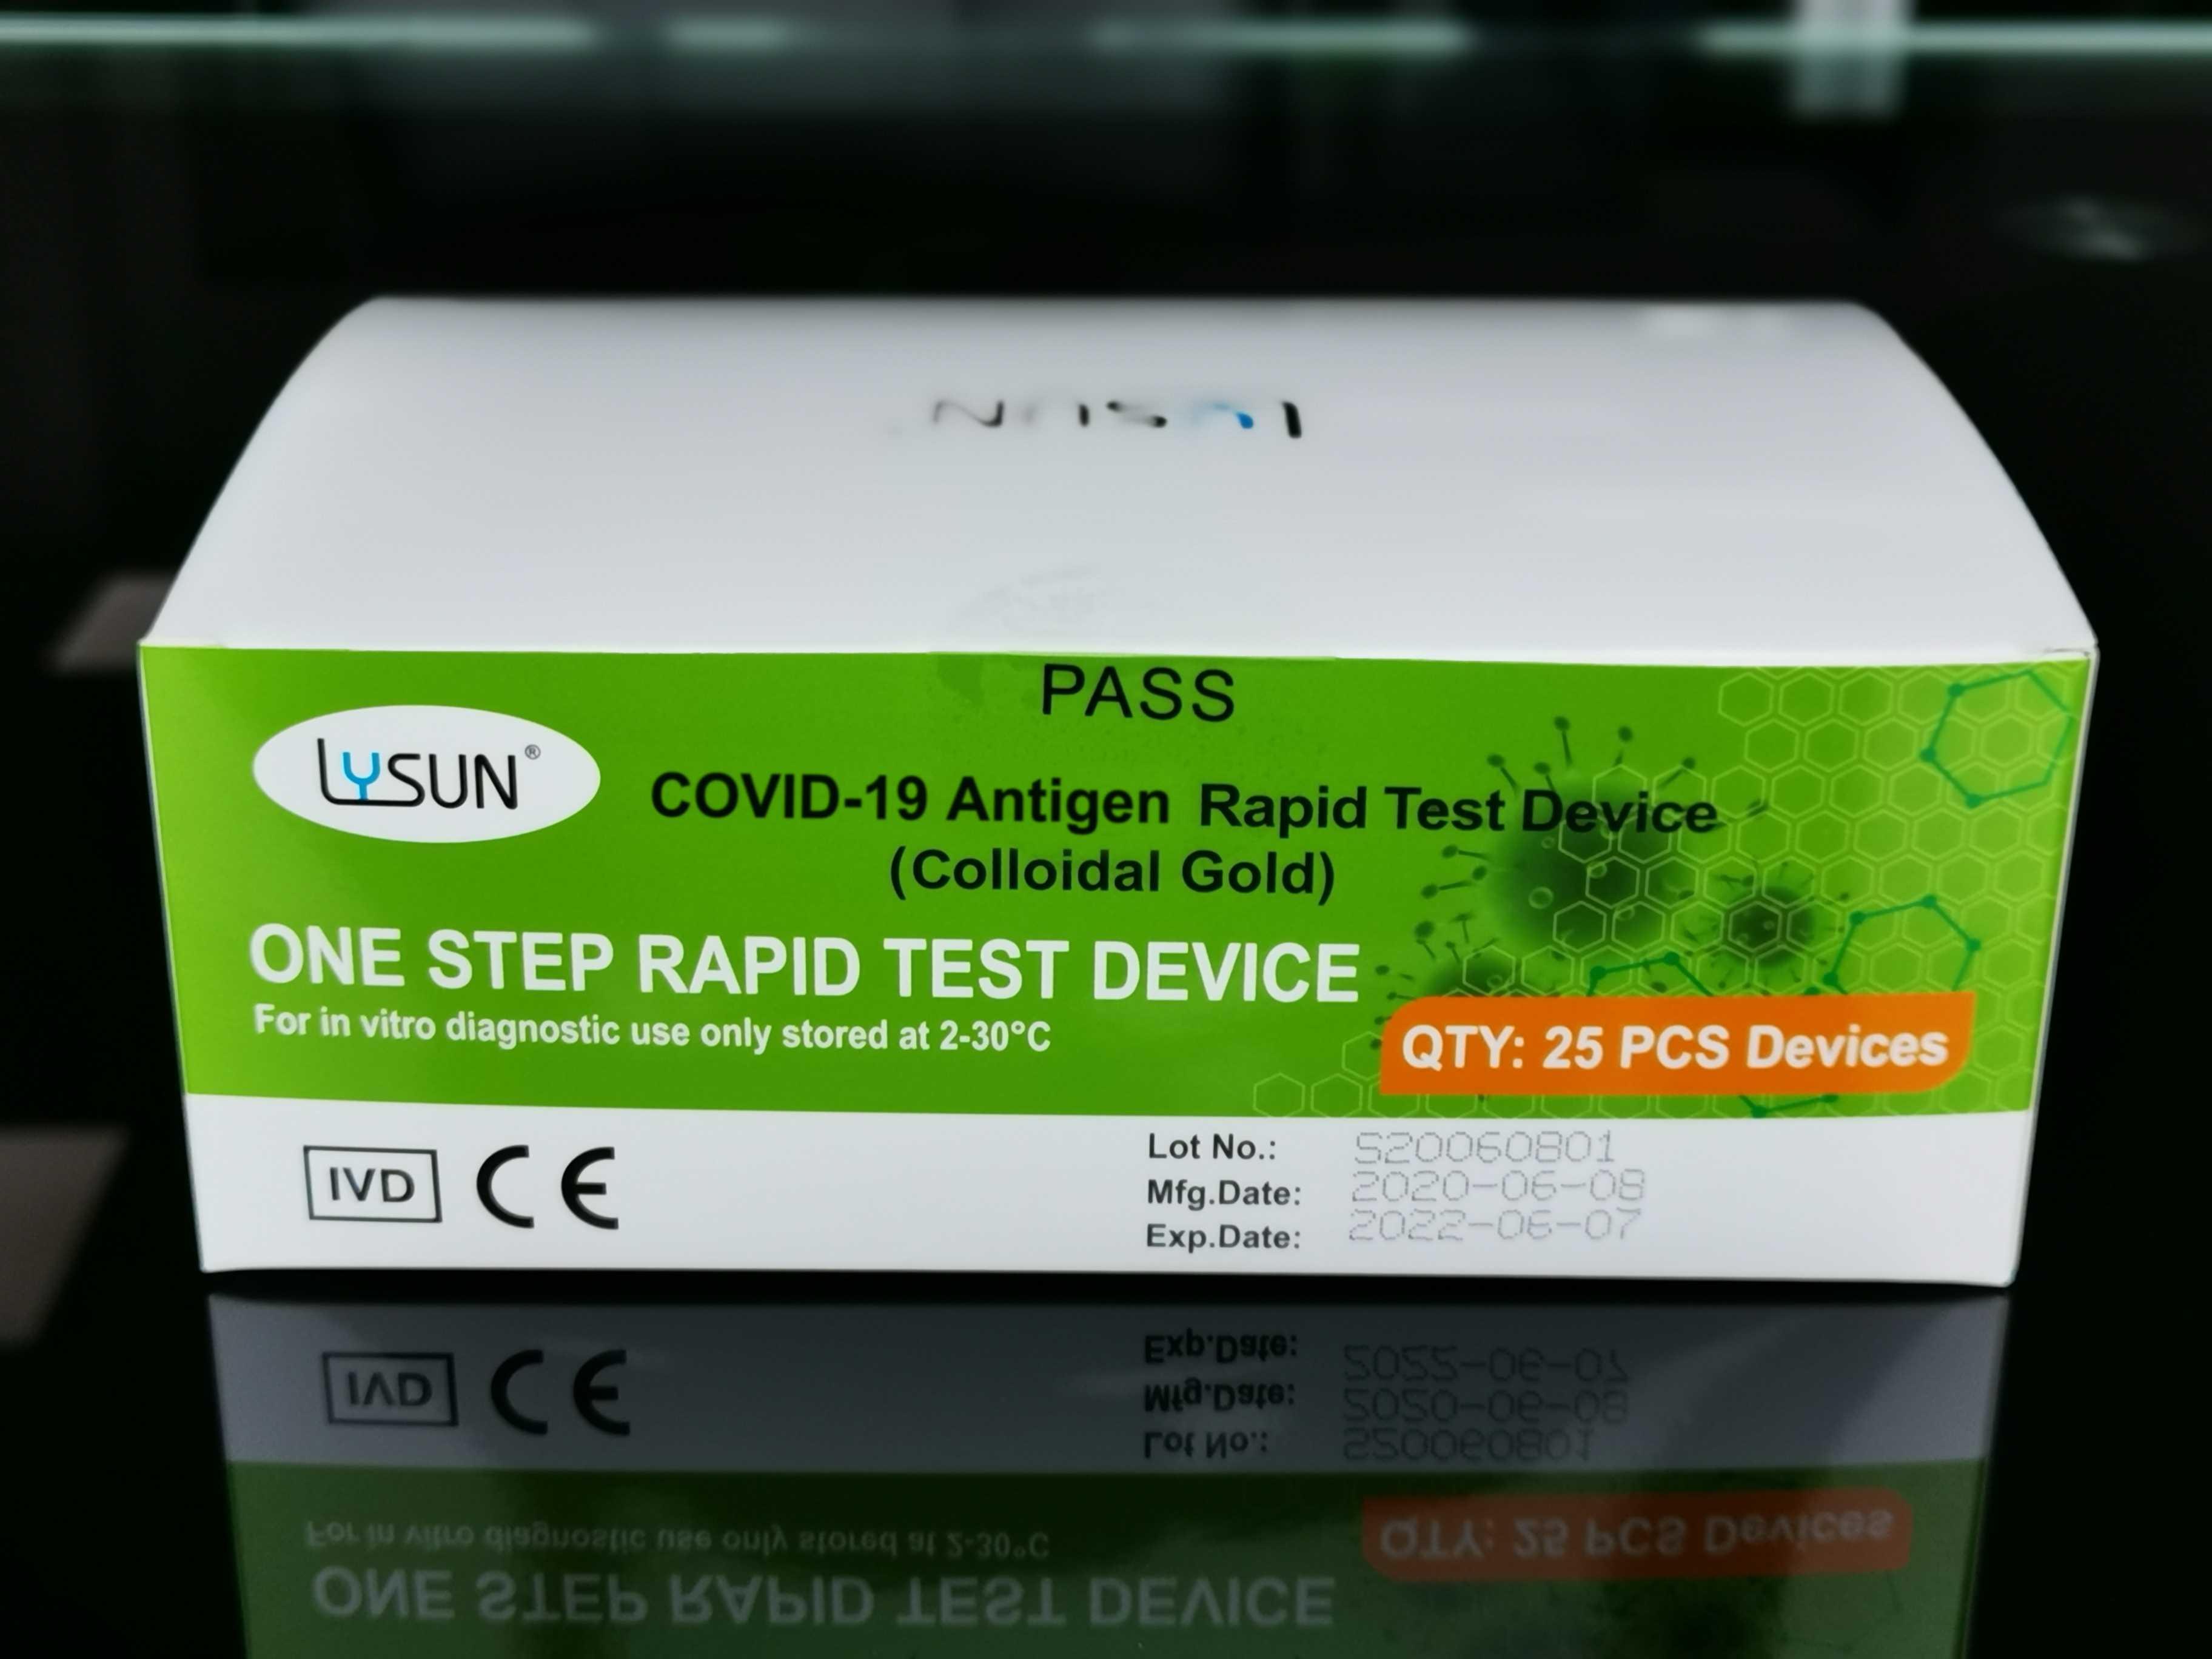 LYSUN COVID-19 Antigen Schnelltest (Colloidal Gold) 25 Stück